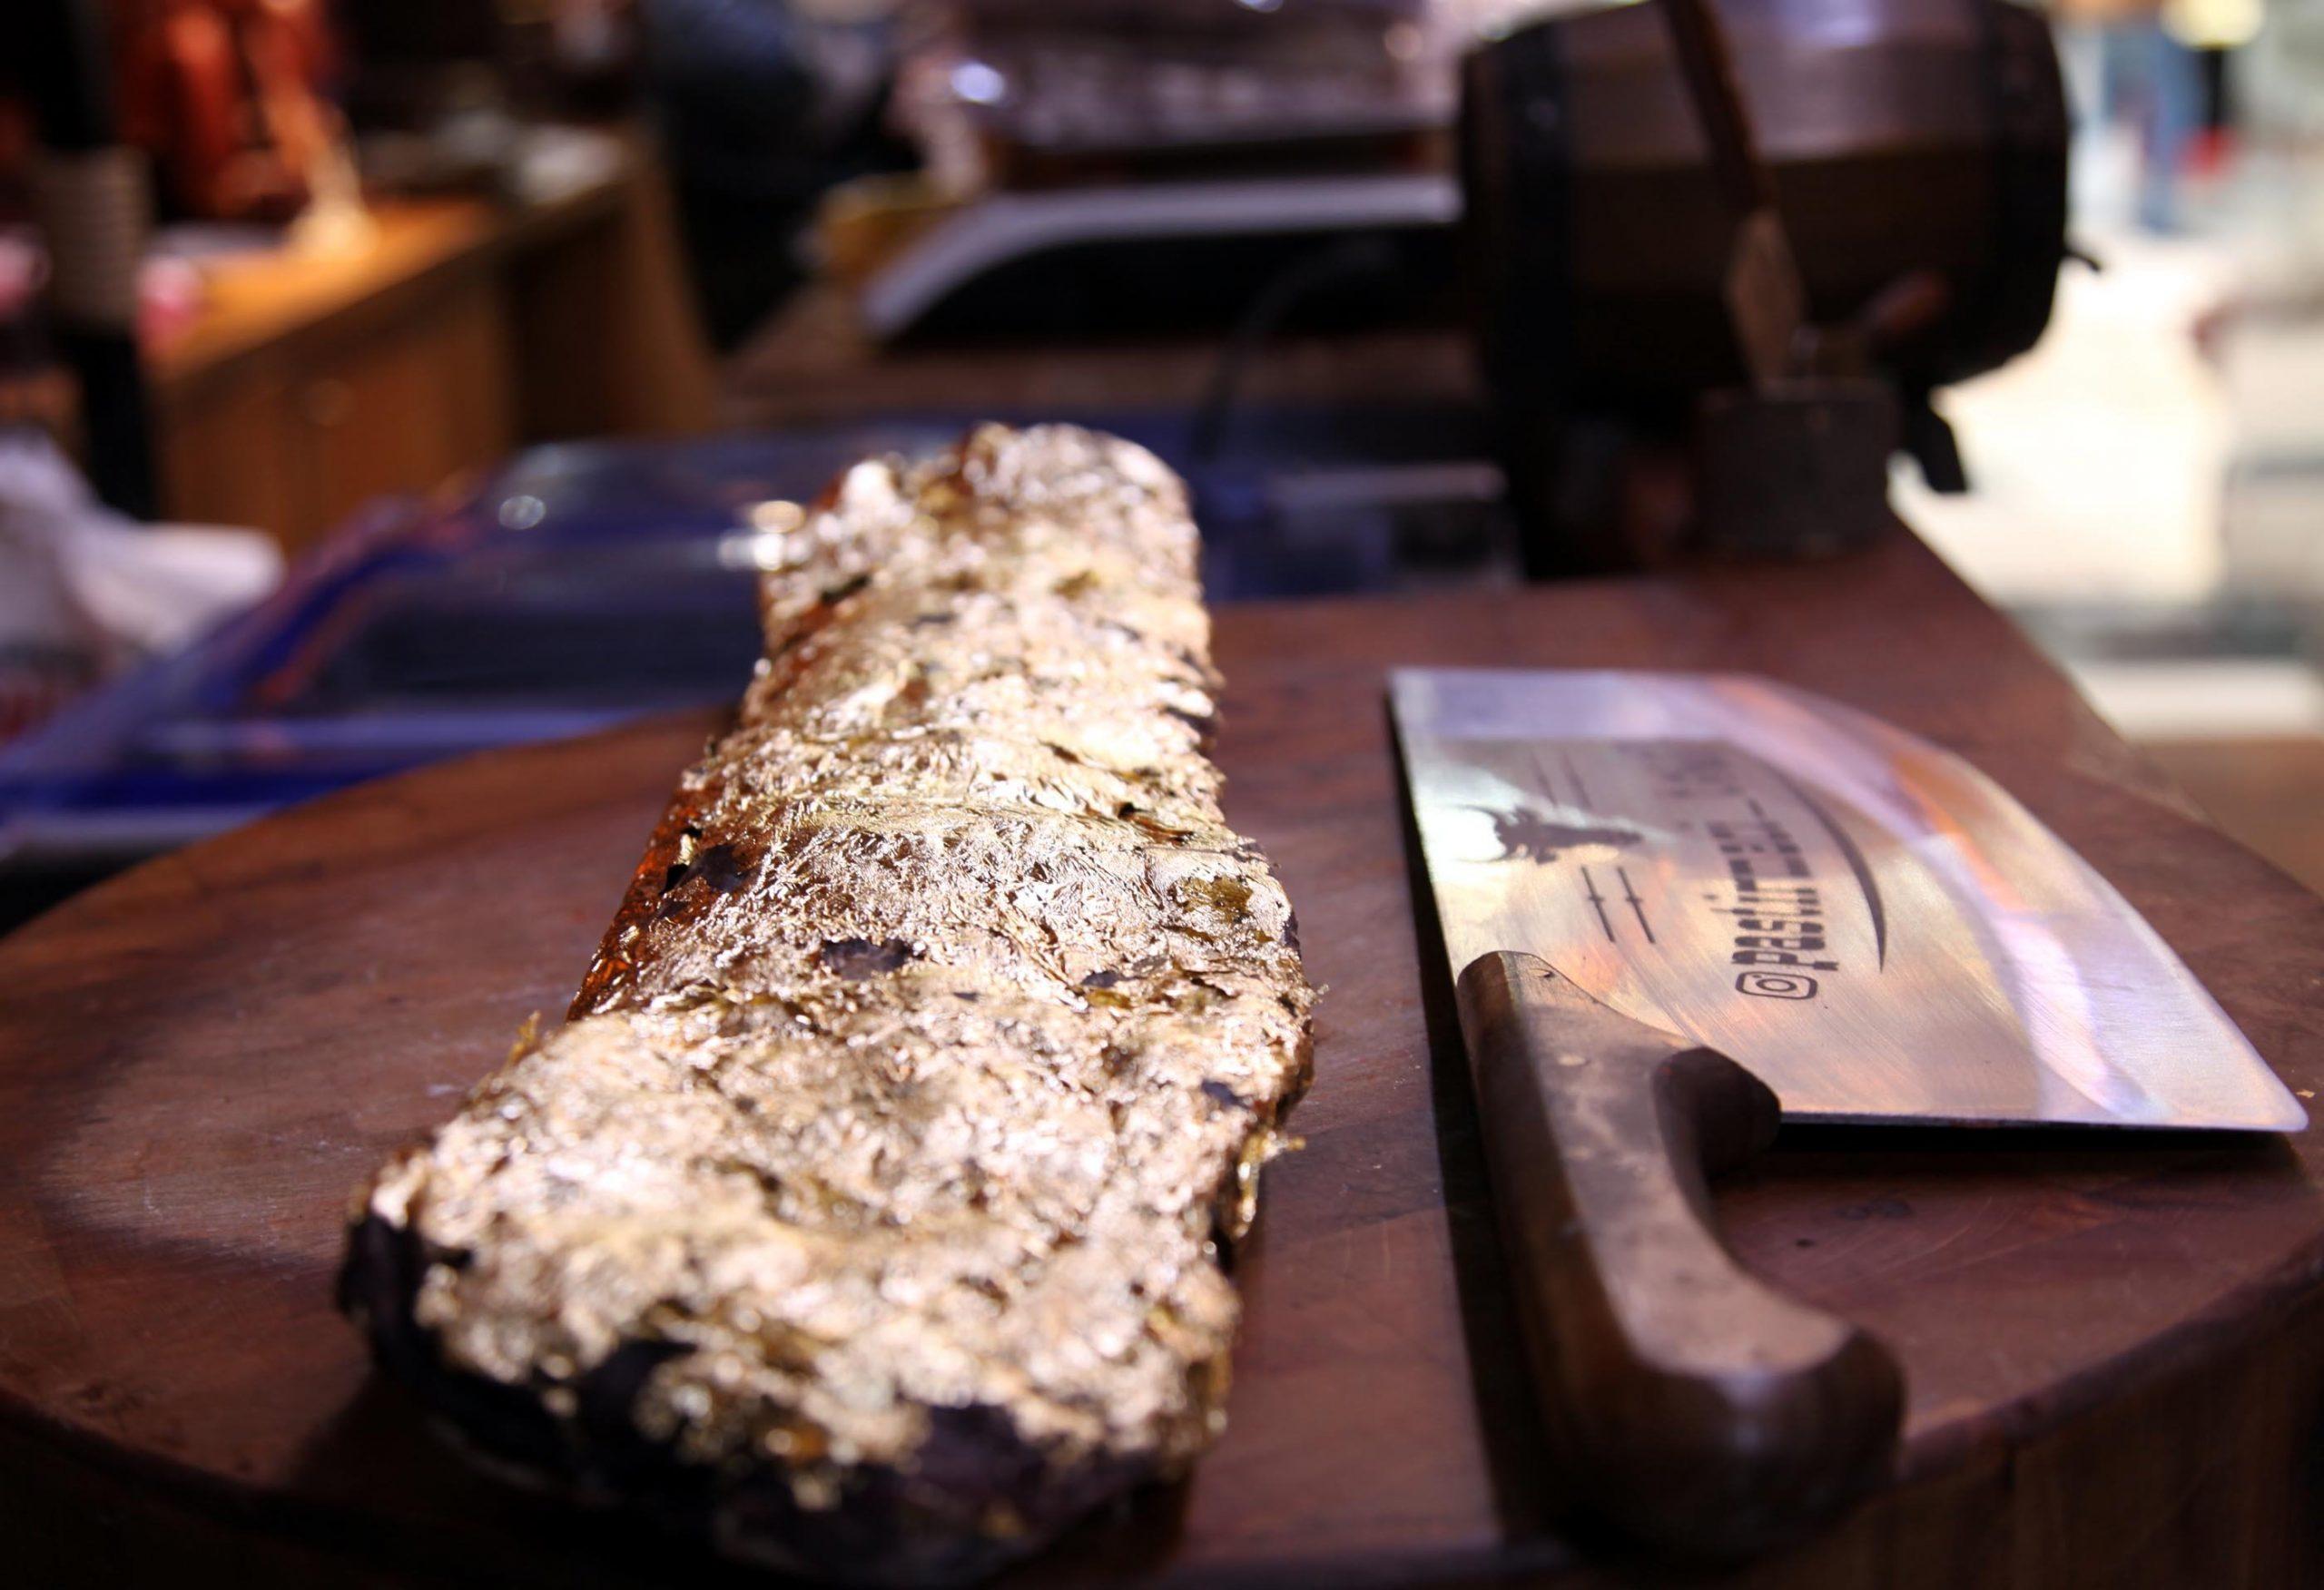 A kilogram of the golden pastırma sells for TL 800. (DHA Photo)